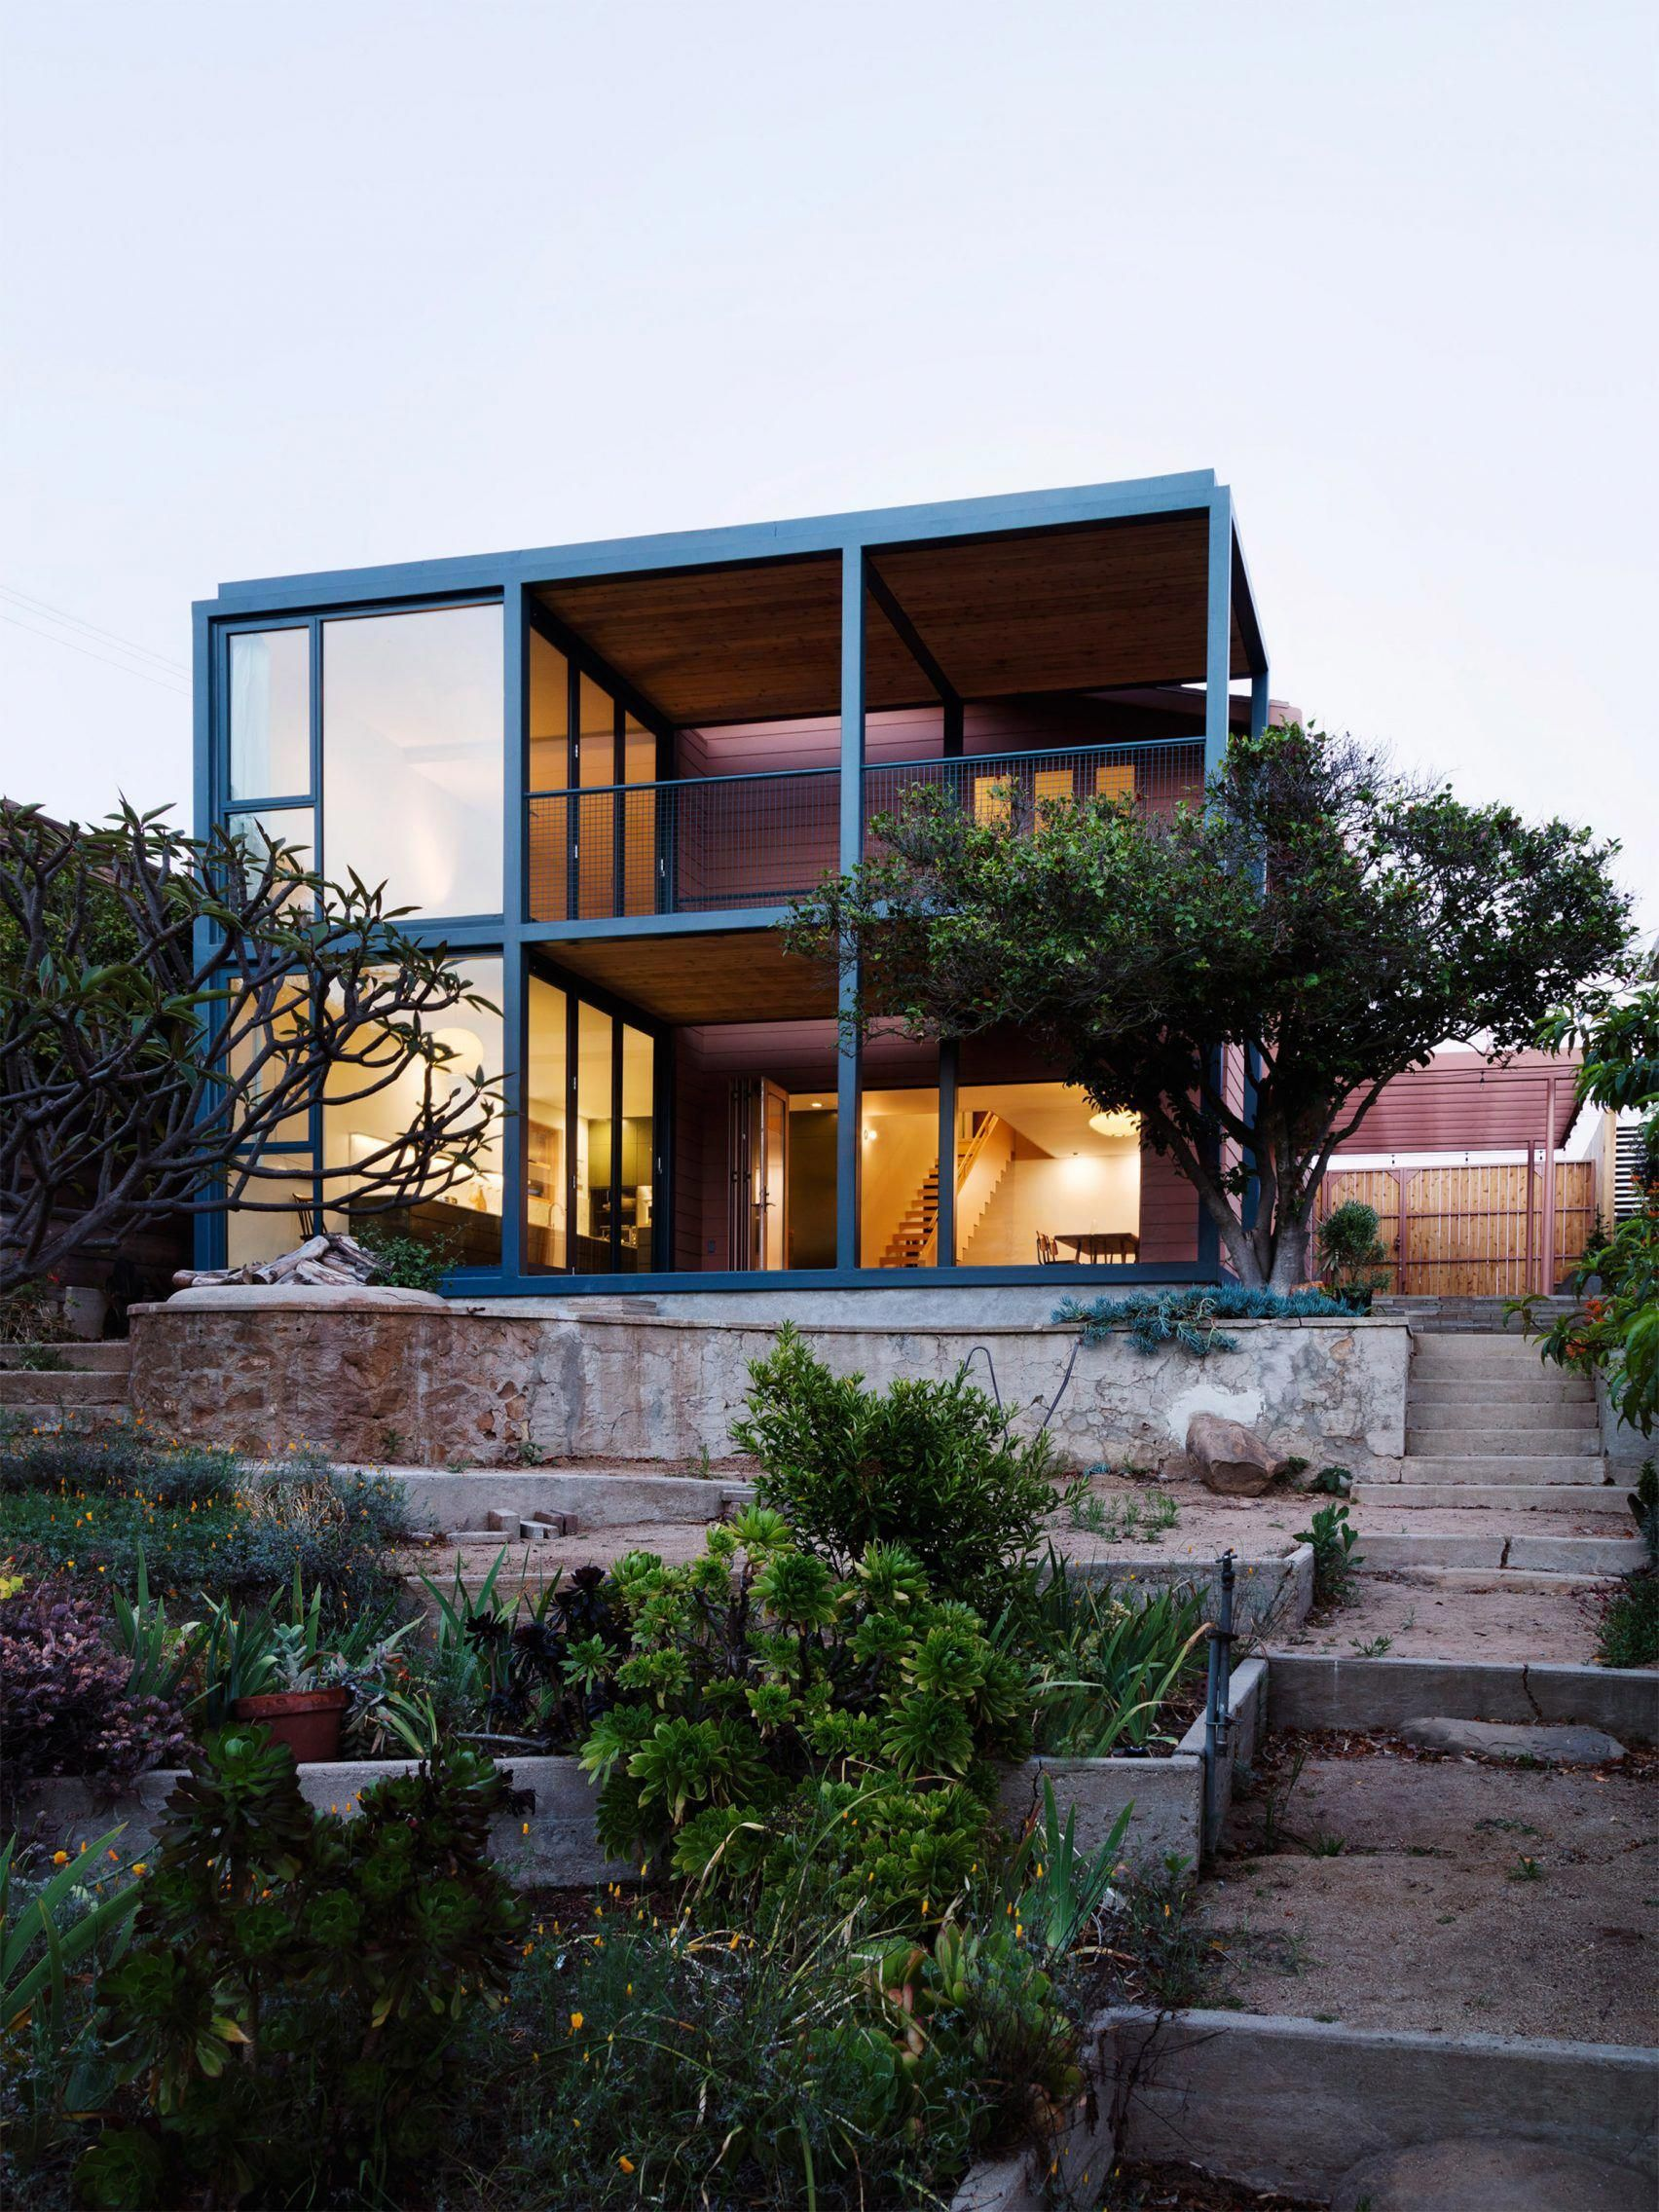 Photography rory gardiner sweet home make interior decoration design ideas decor also rh pinterest